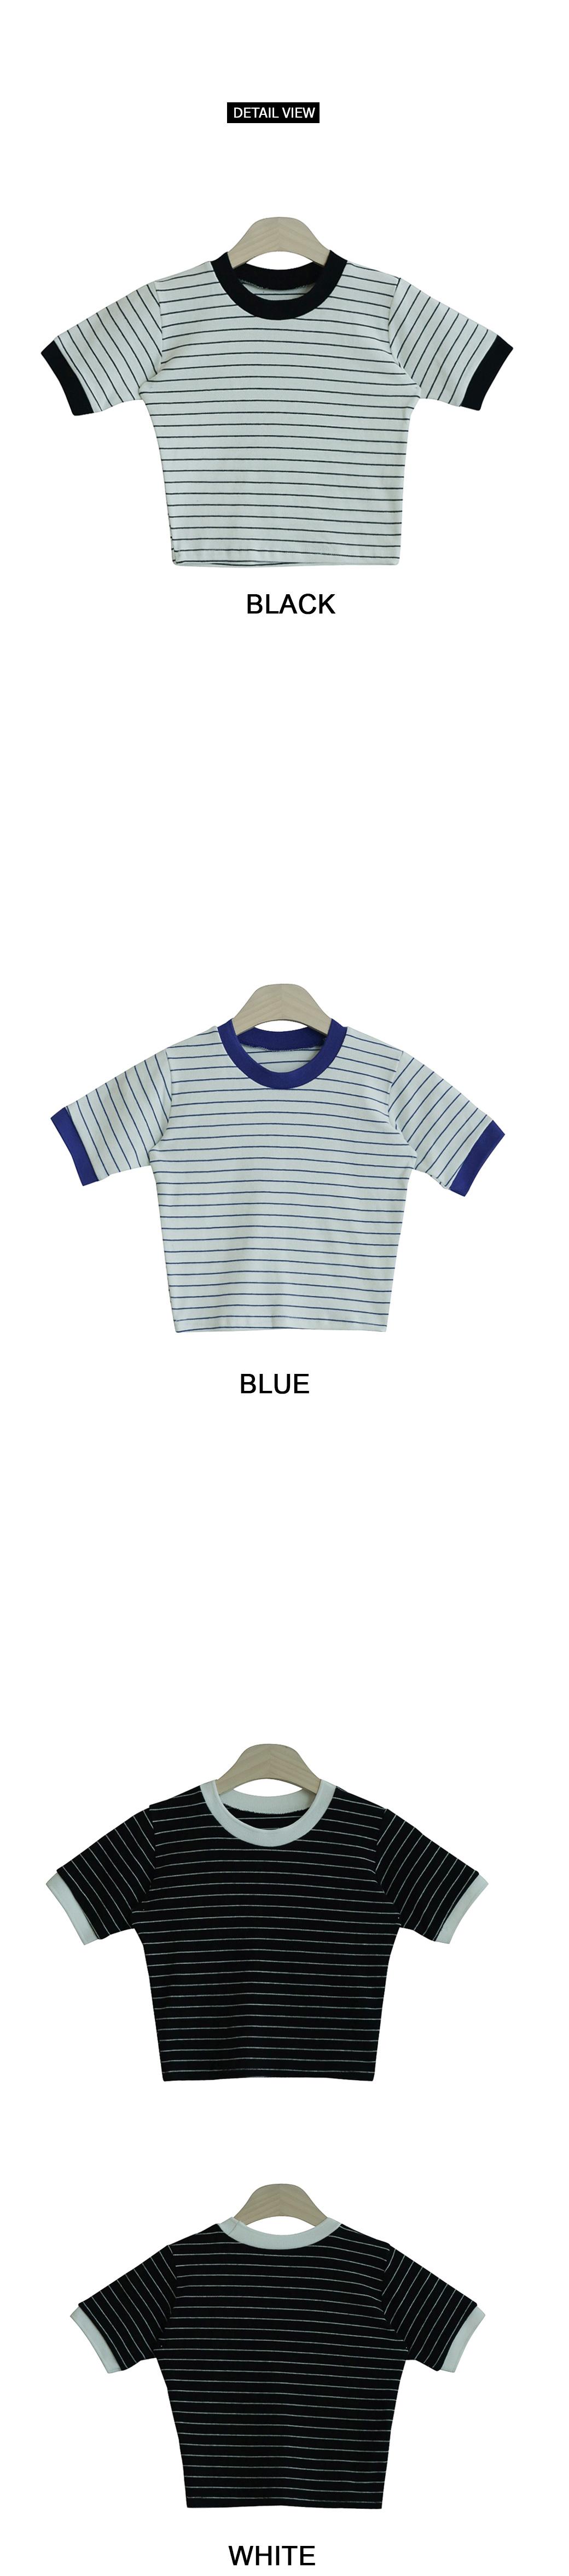 Honey Dana T-shirt color scheme